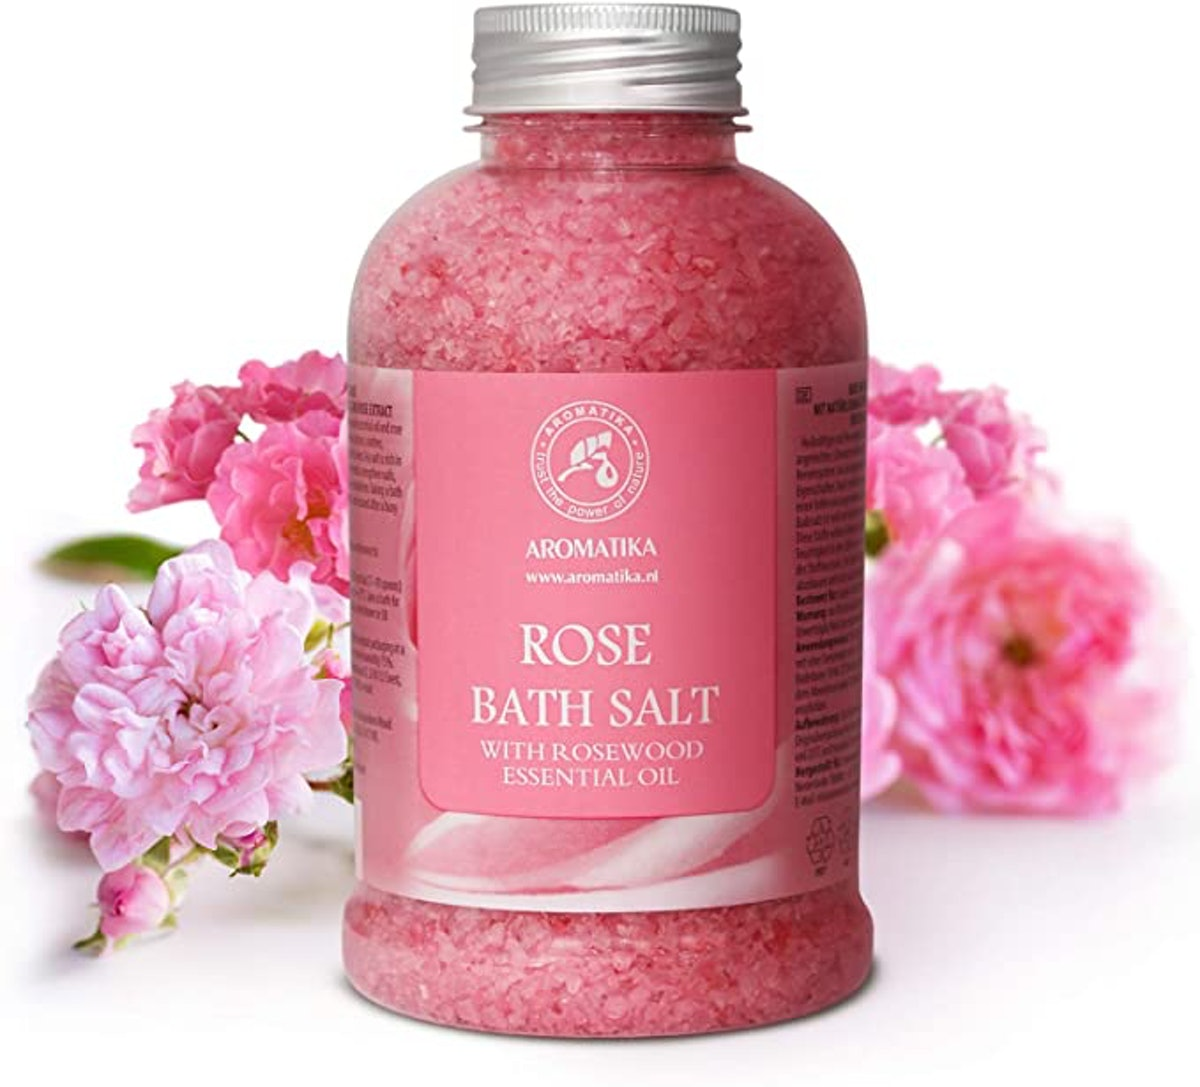 AROMATIKA Rose Bath Salts